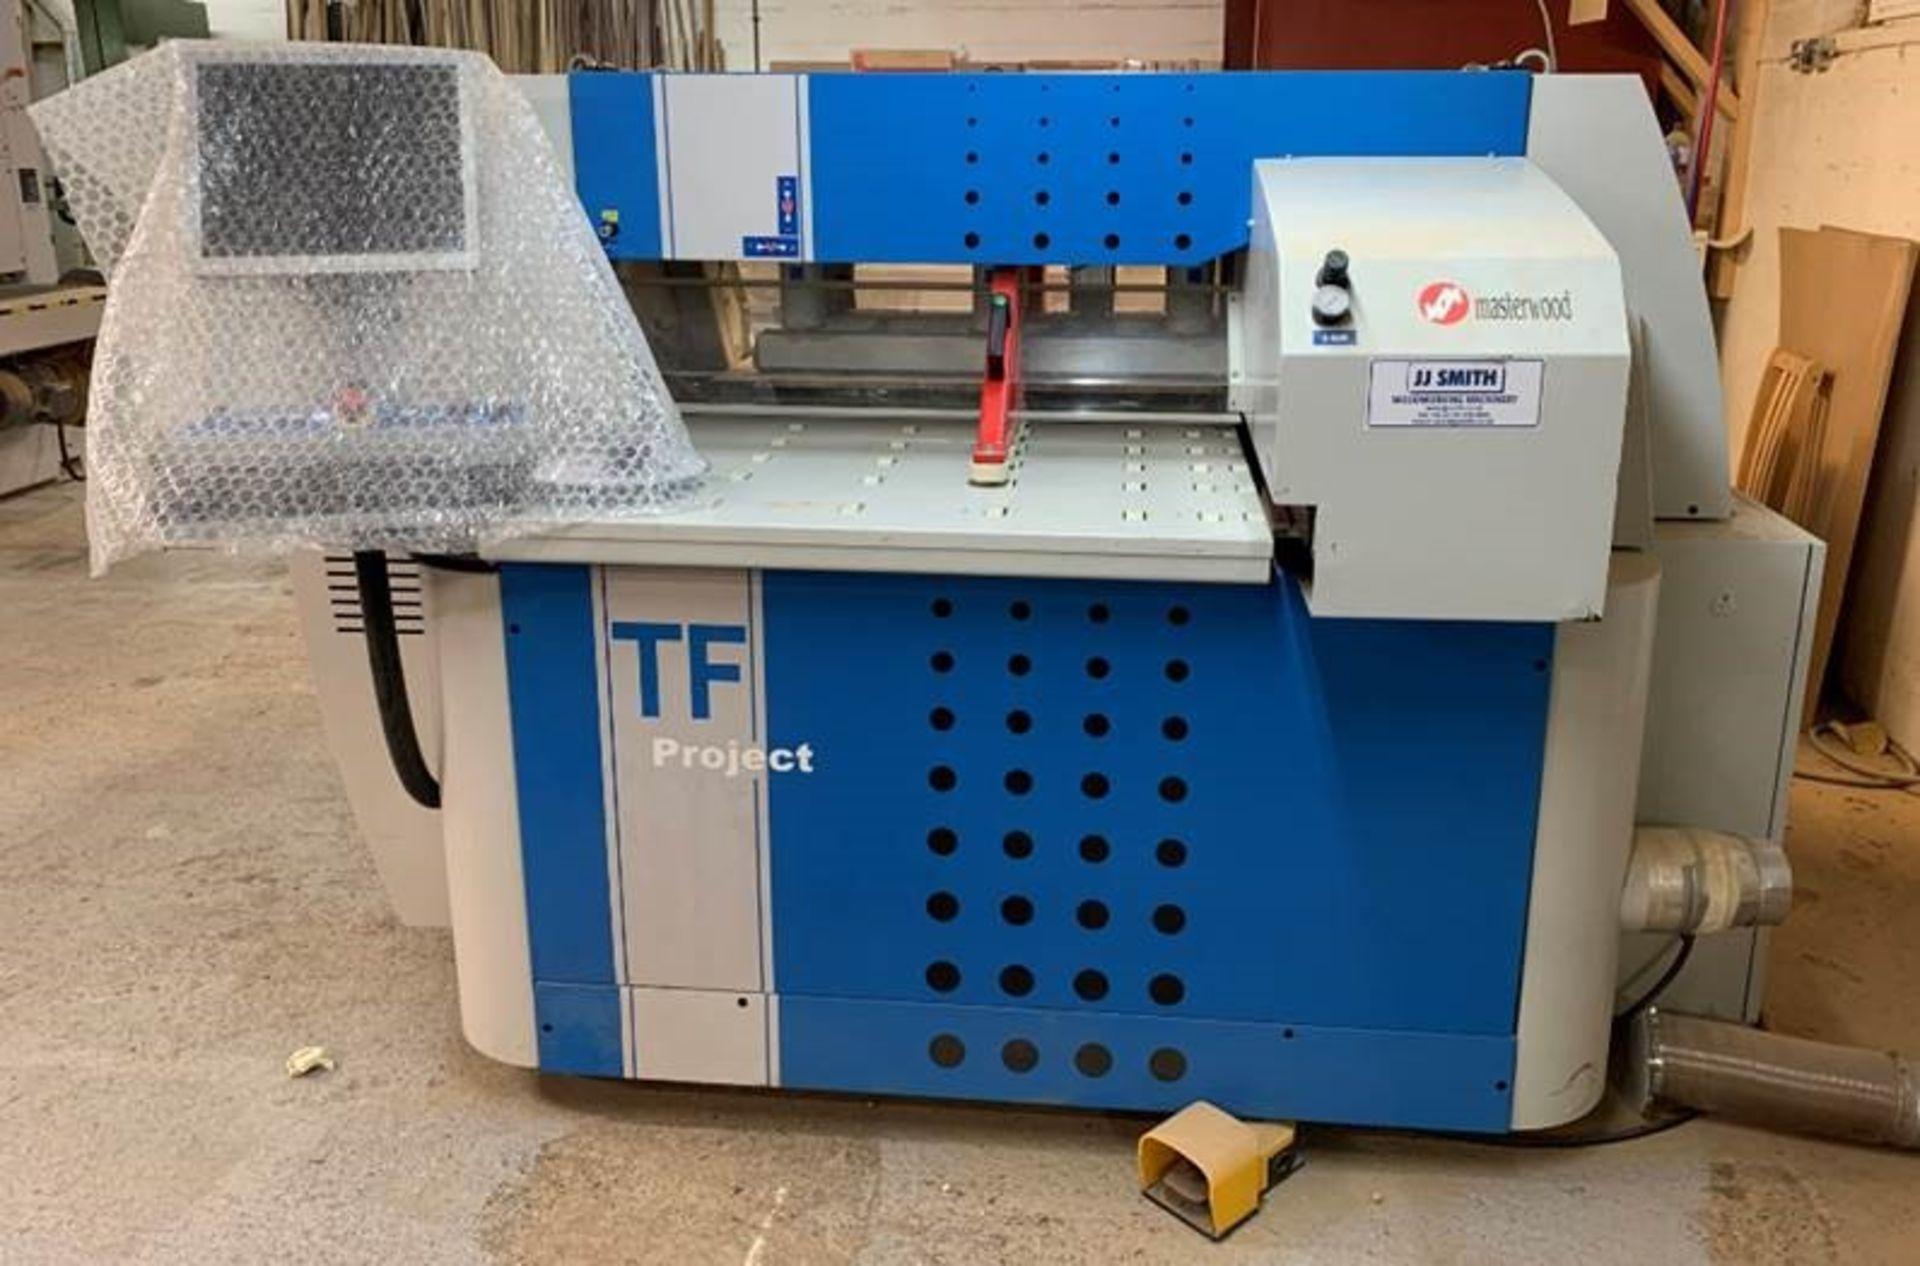 2010 Masterwood Project TF100 CNC Machine Centre